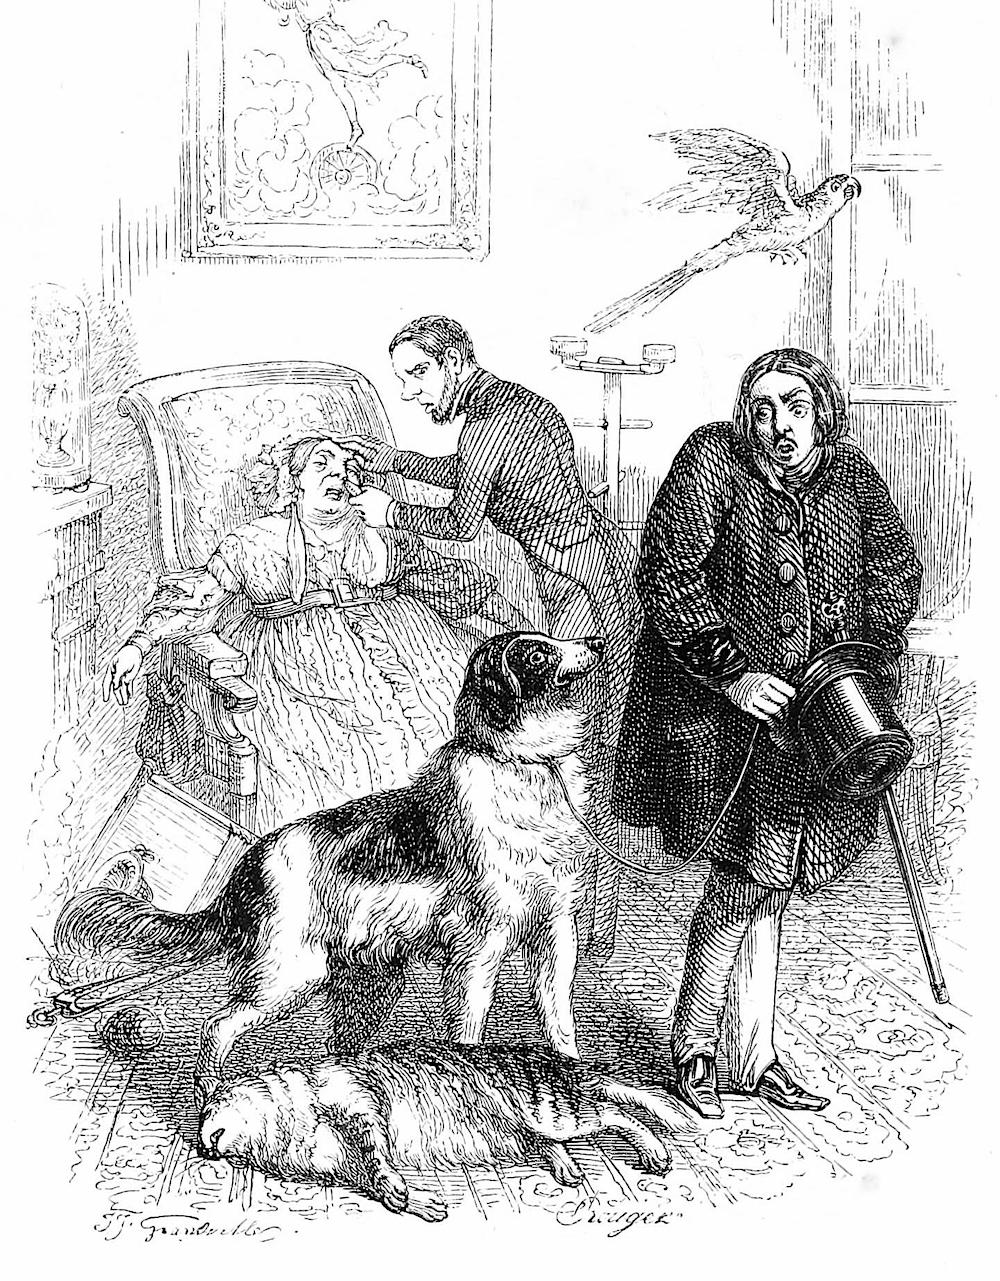 a J.J. Grandville cartoon, a guest's dog kills a host's cat